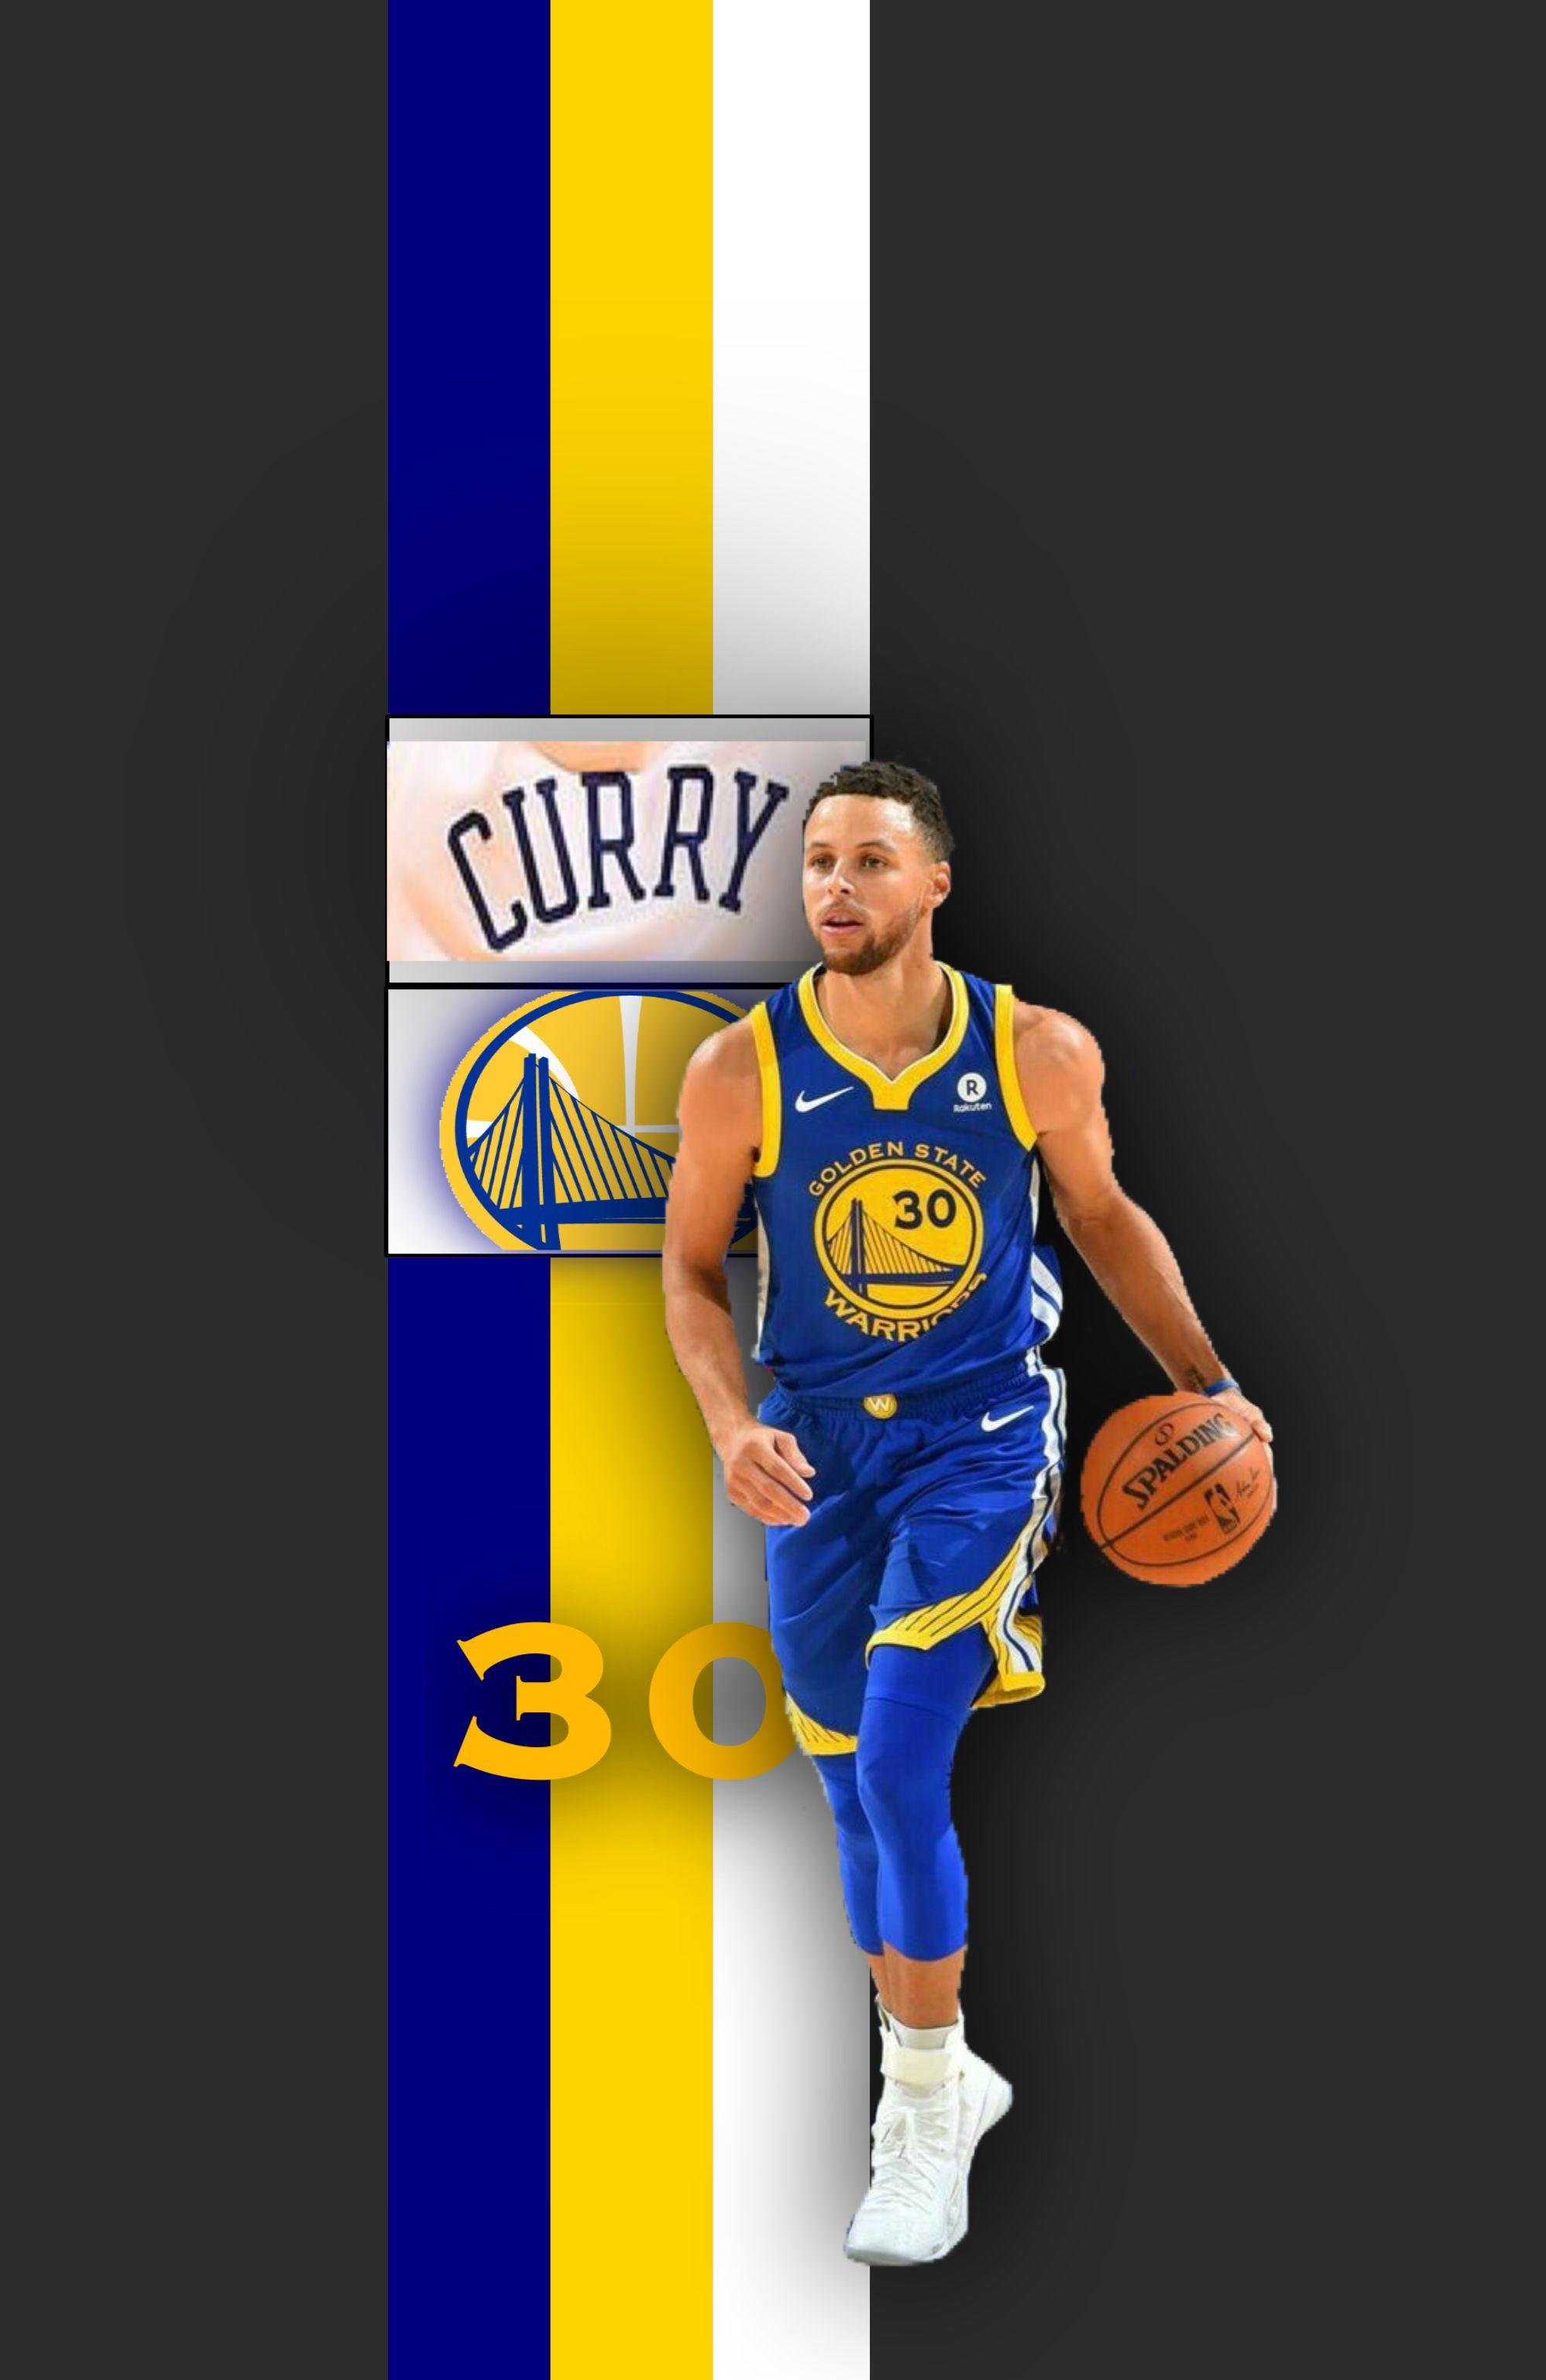 Stephen Curry Stephen Curry Basketball Golden State Warriors Wallpaper Nba Wallpapers Stephen Curry